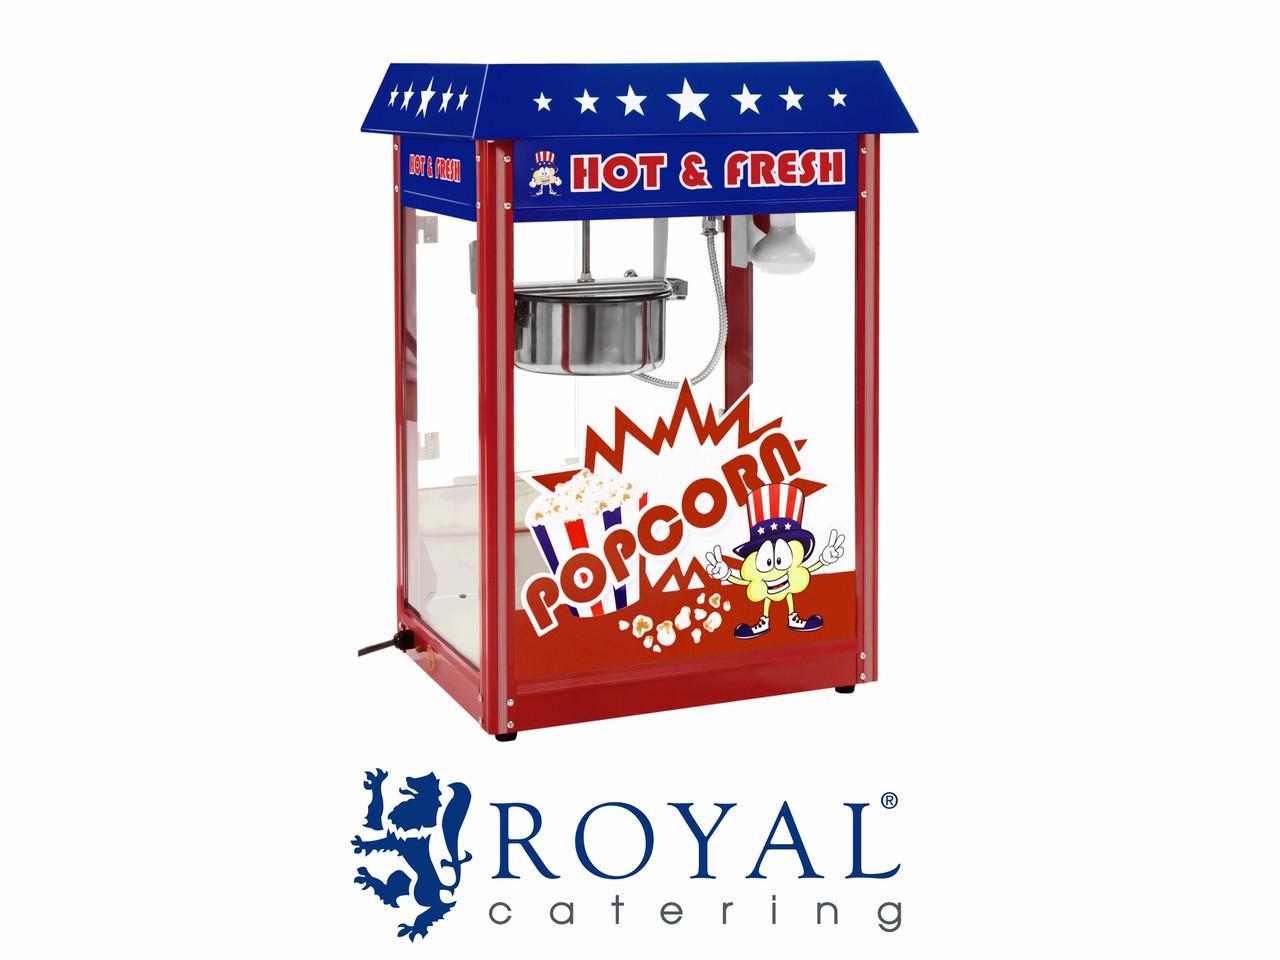 Машина для попкорну ROYAL